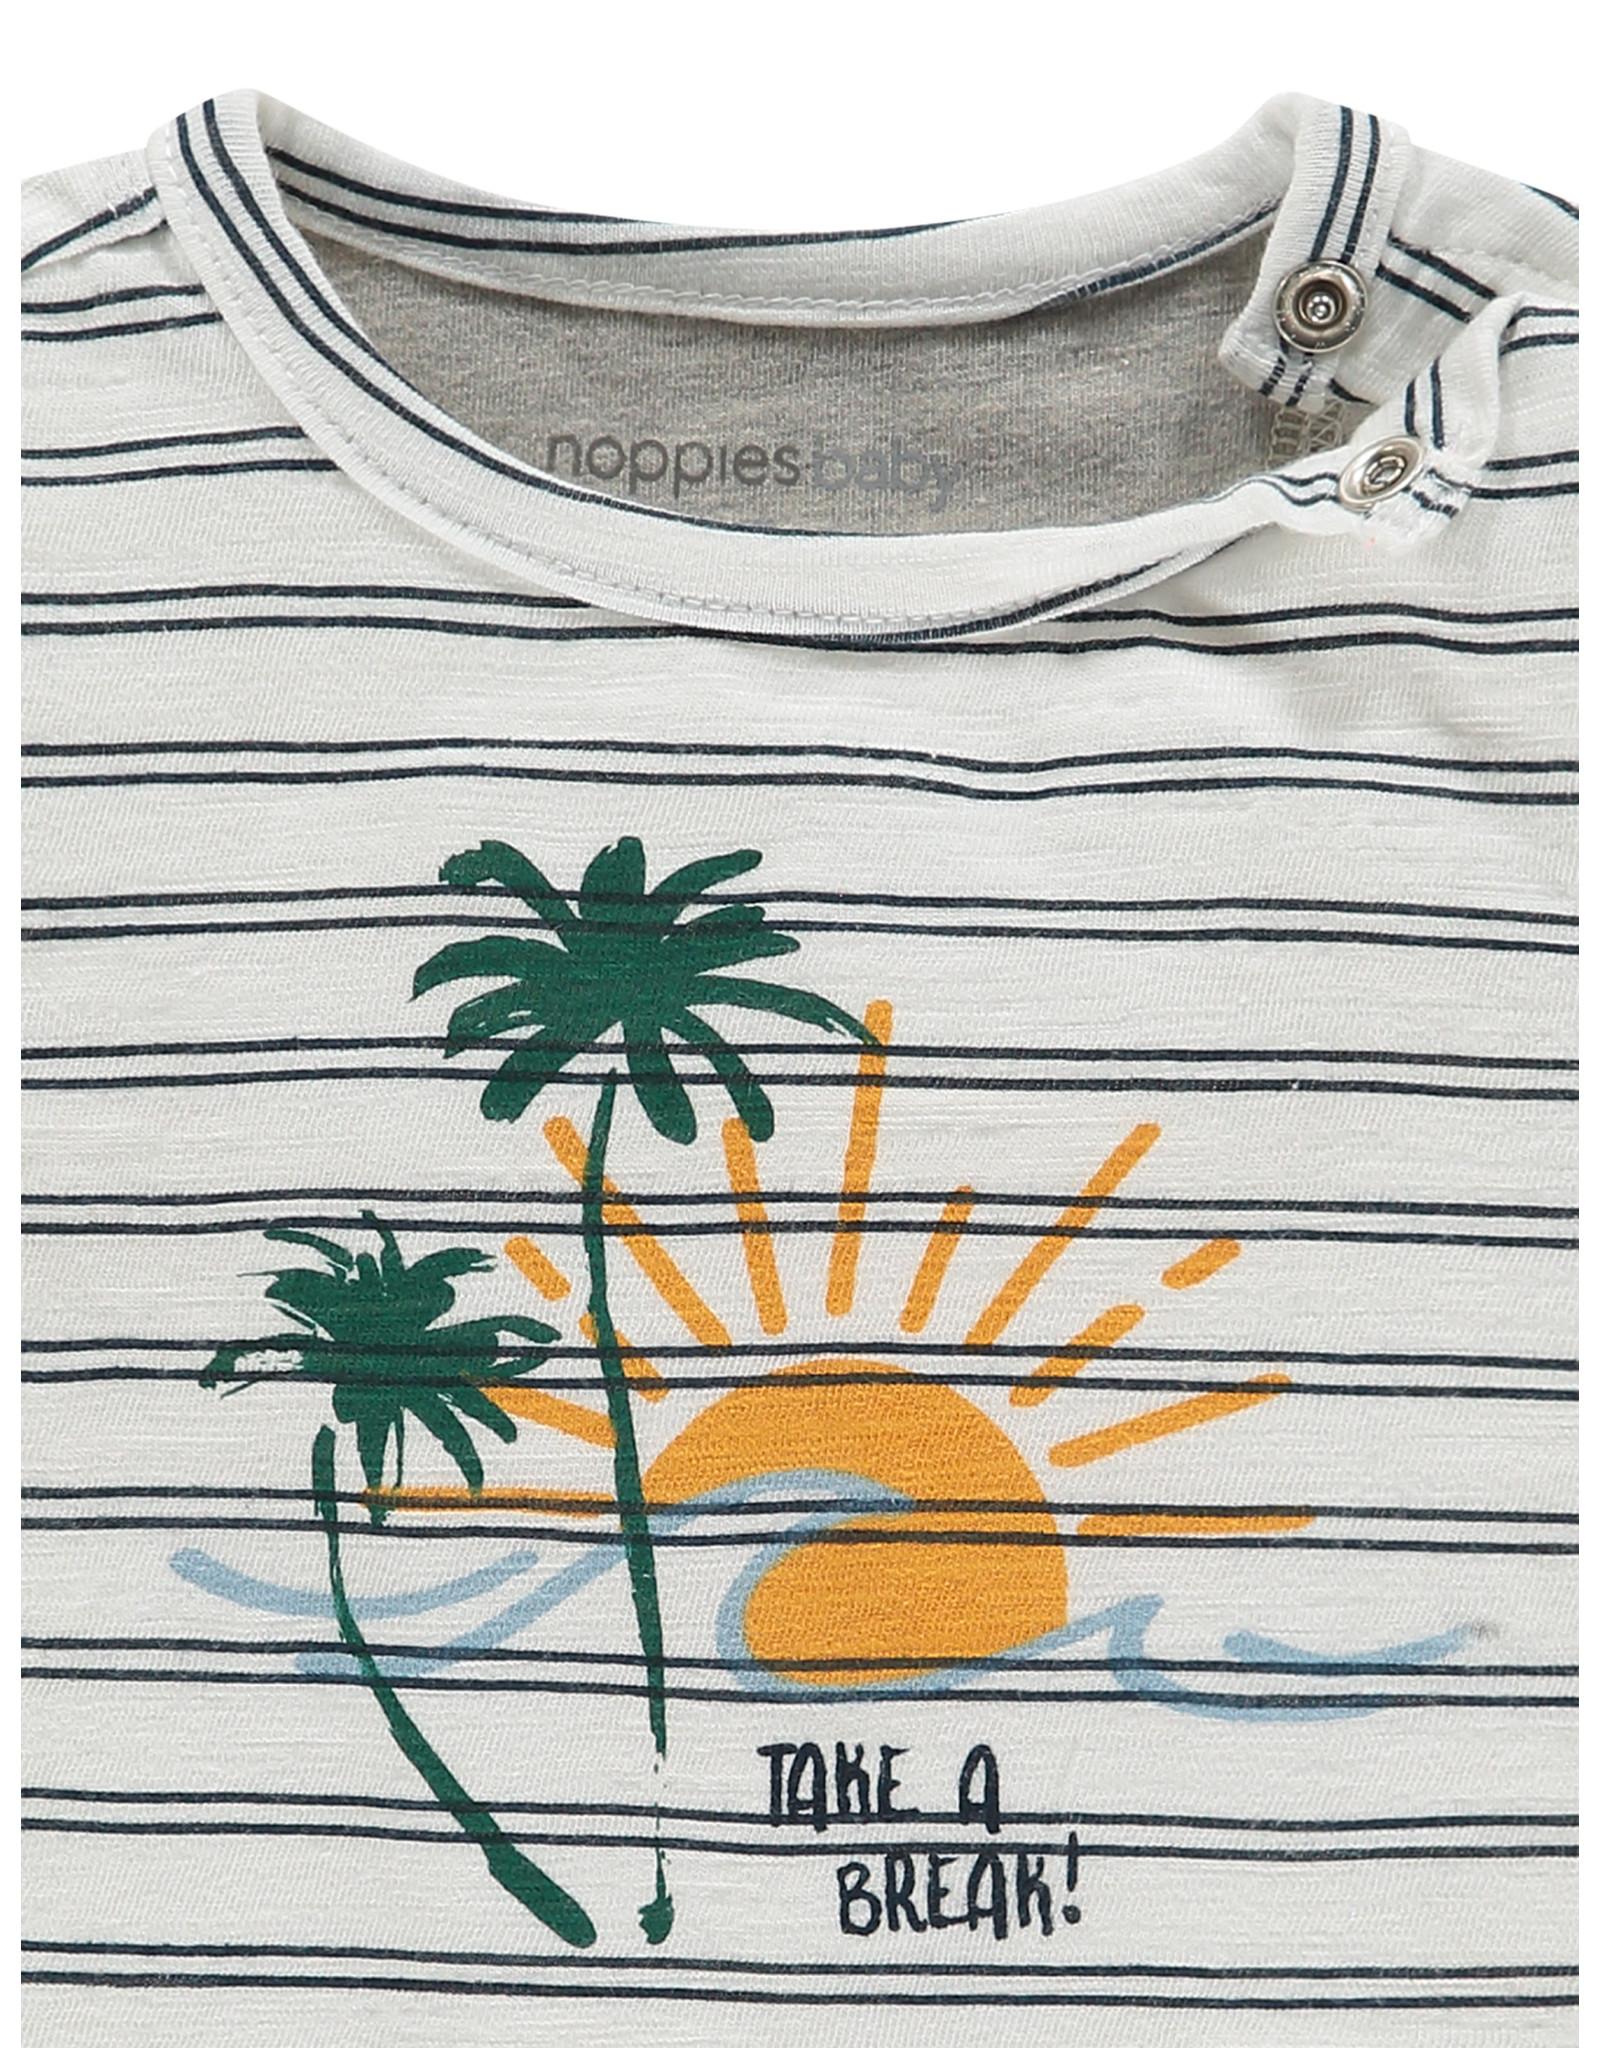 Noppies B Regular T-shirt ss Asbury Park aop, Blanc de Blanc